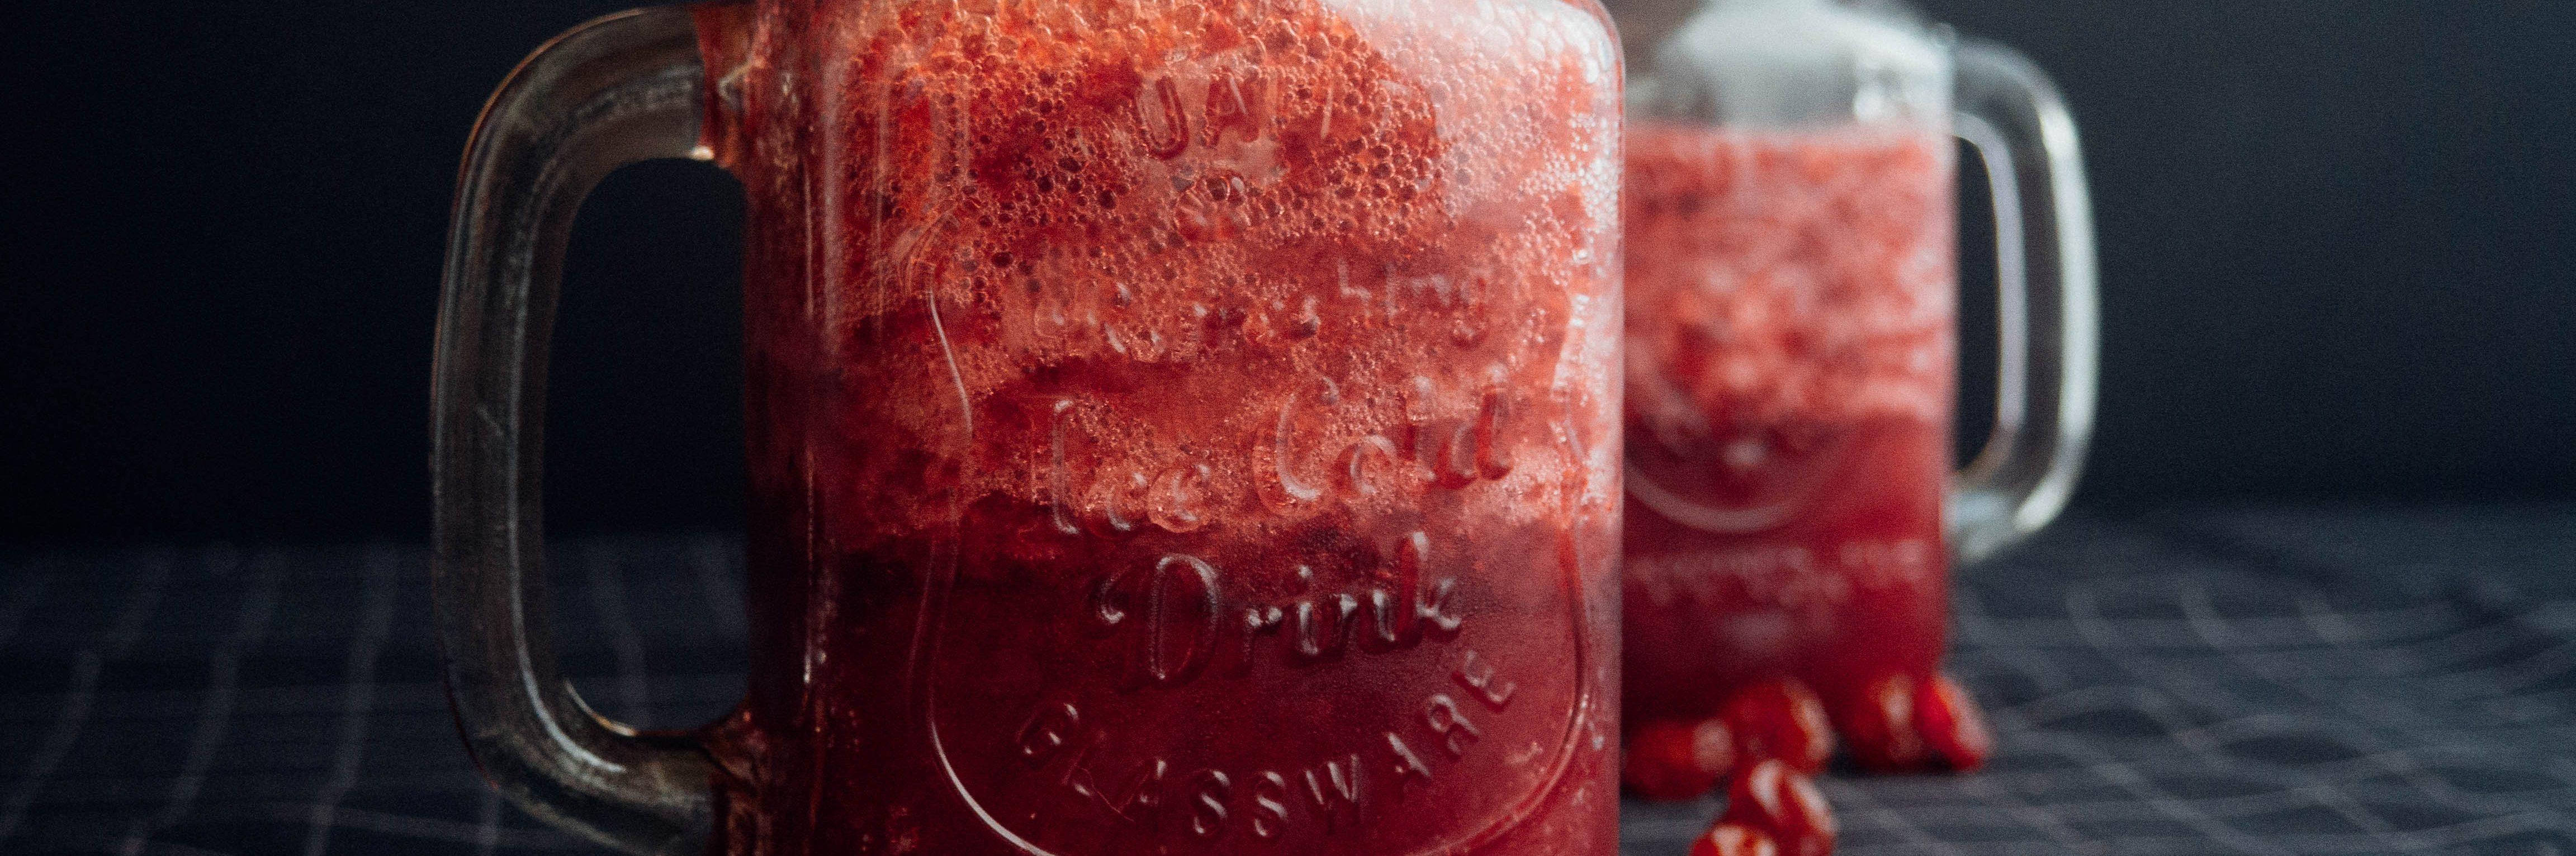 Cranberry Peach Cooler